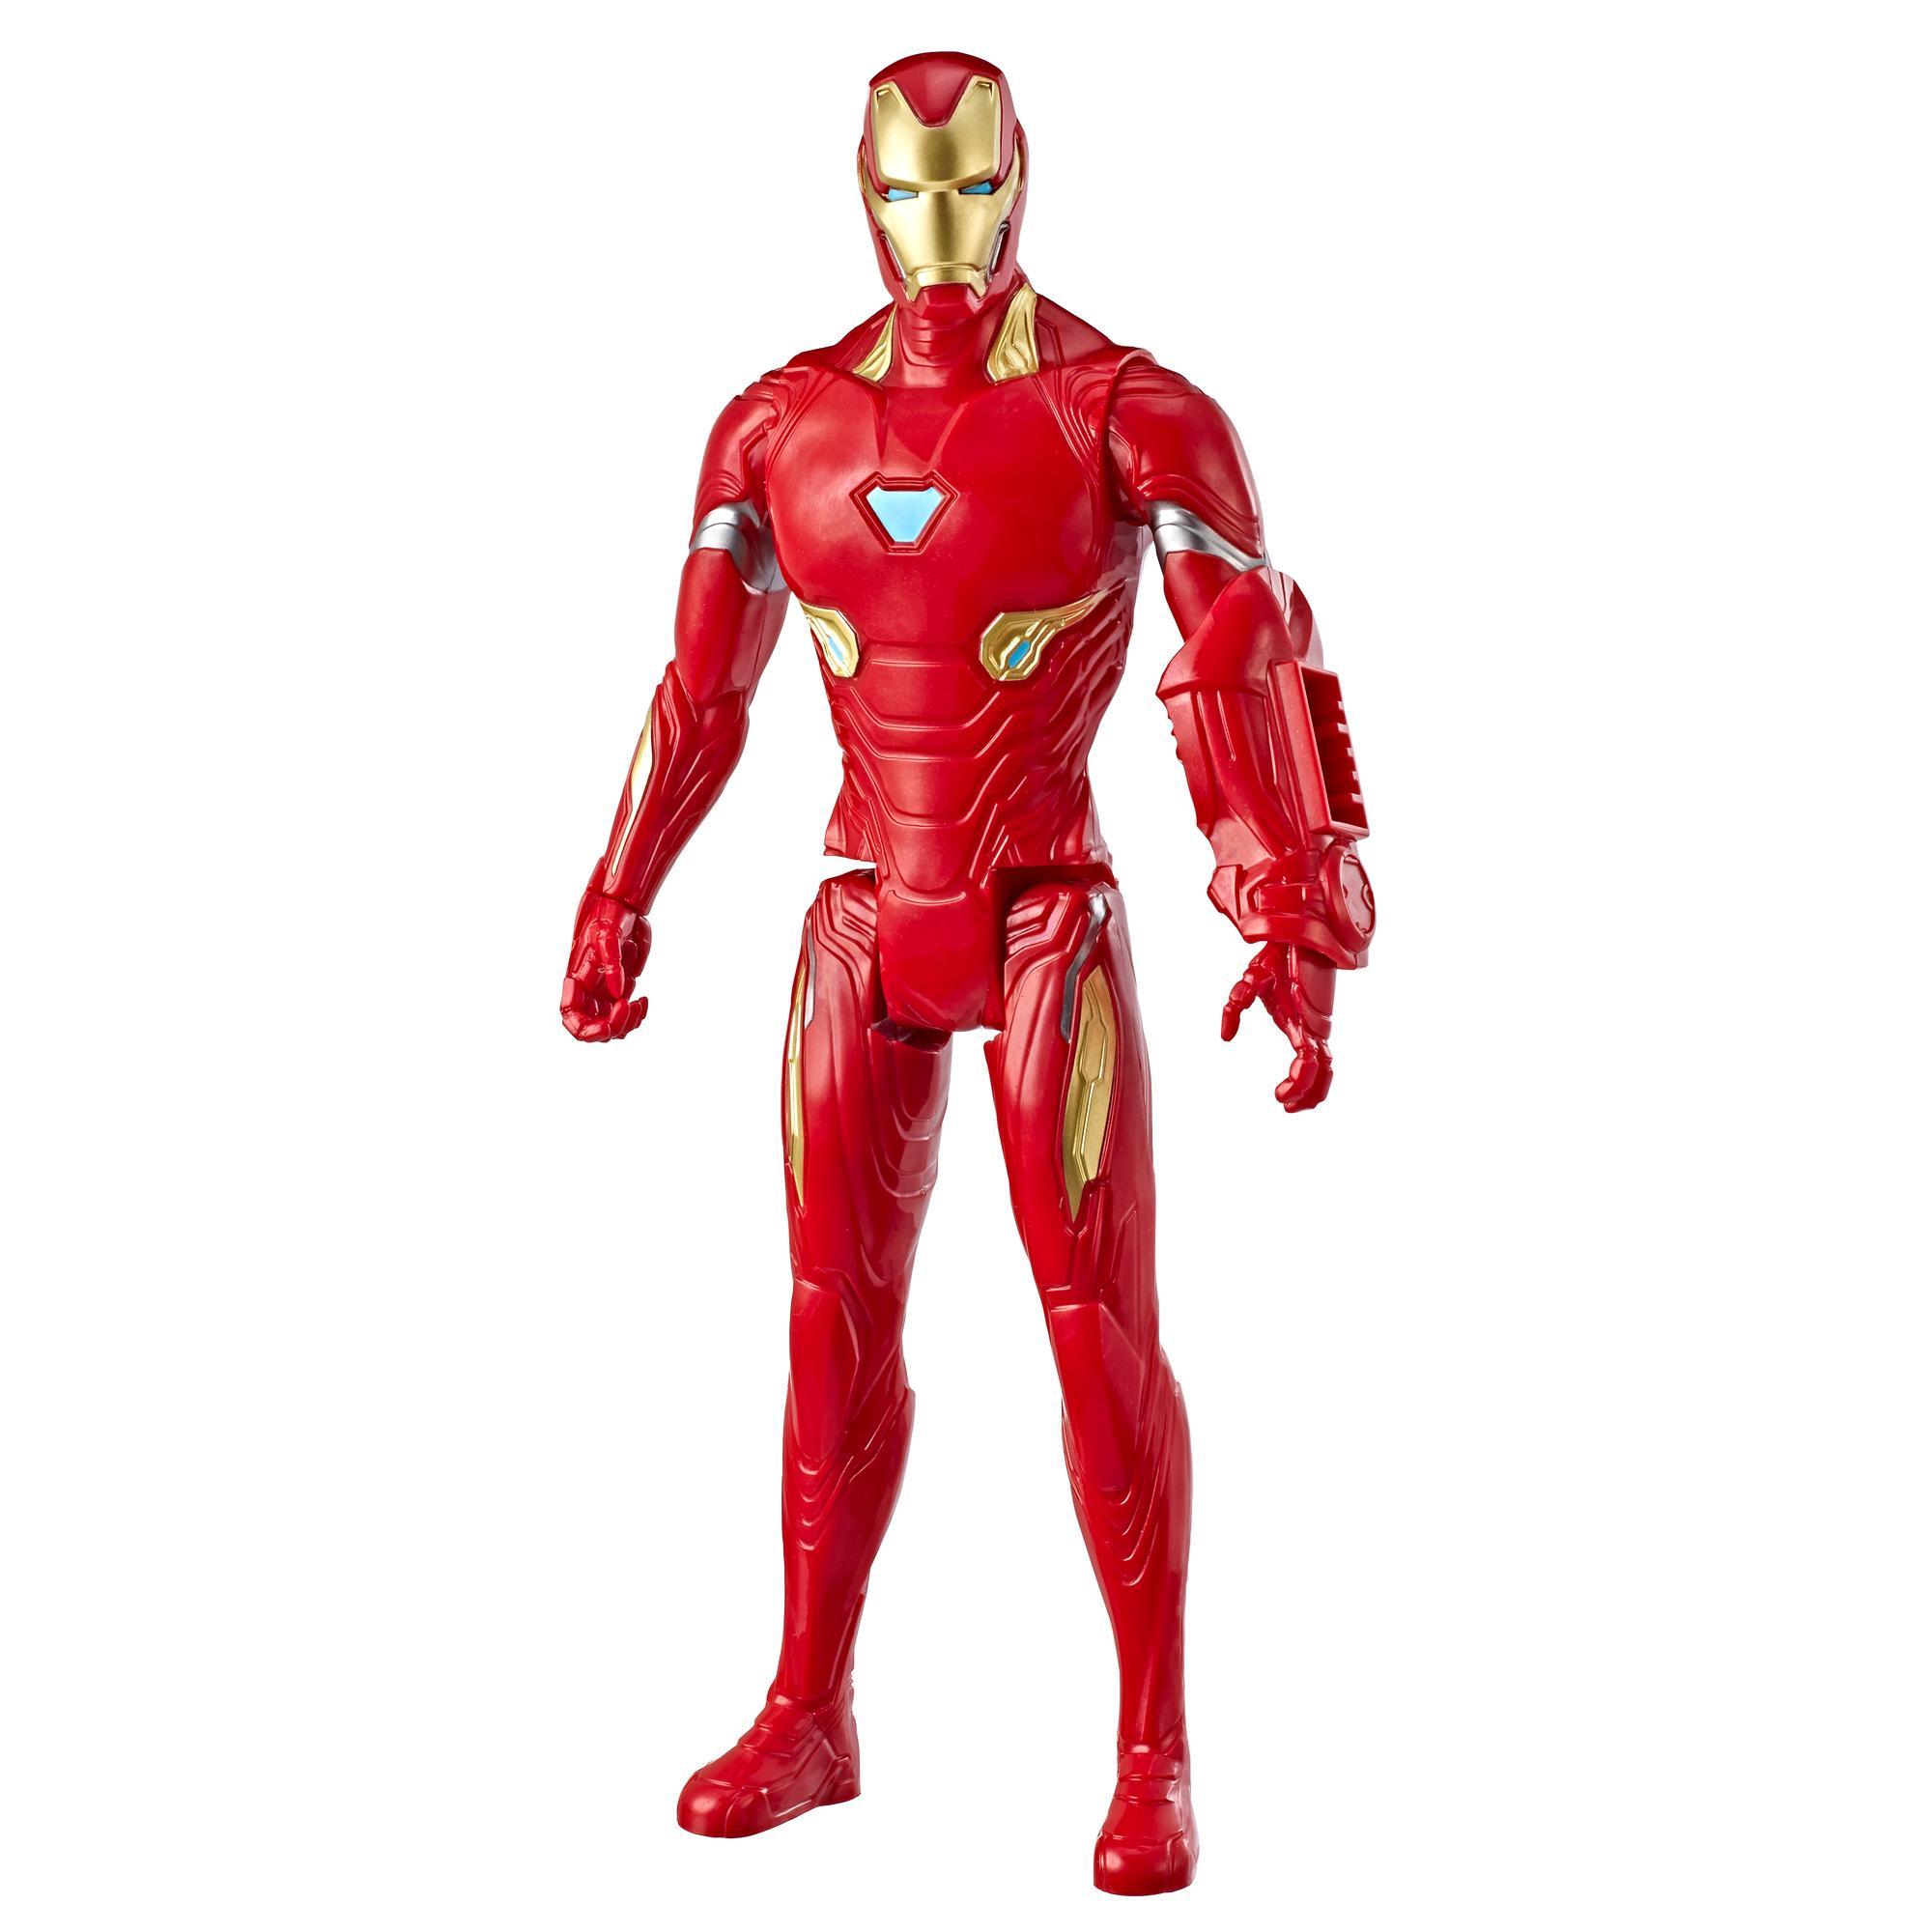 Marvel Avengers: Endgame Titan Hero Series Iron Man 12-Inch Action Figure